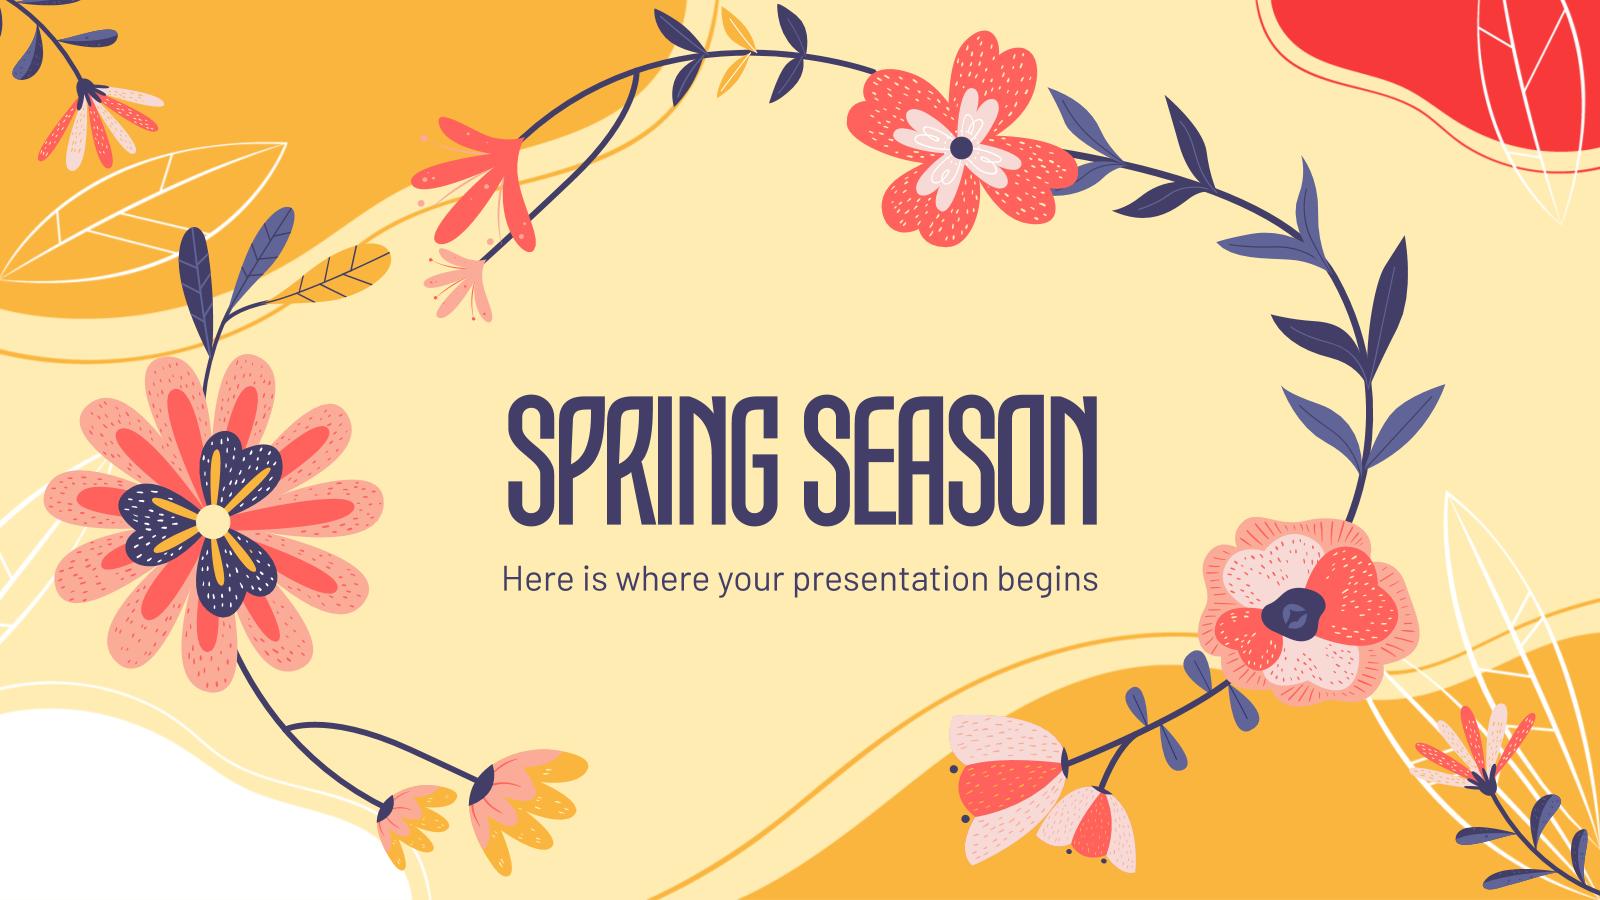 Spring Season presentation template